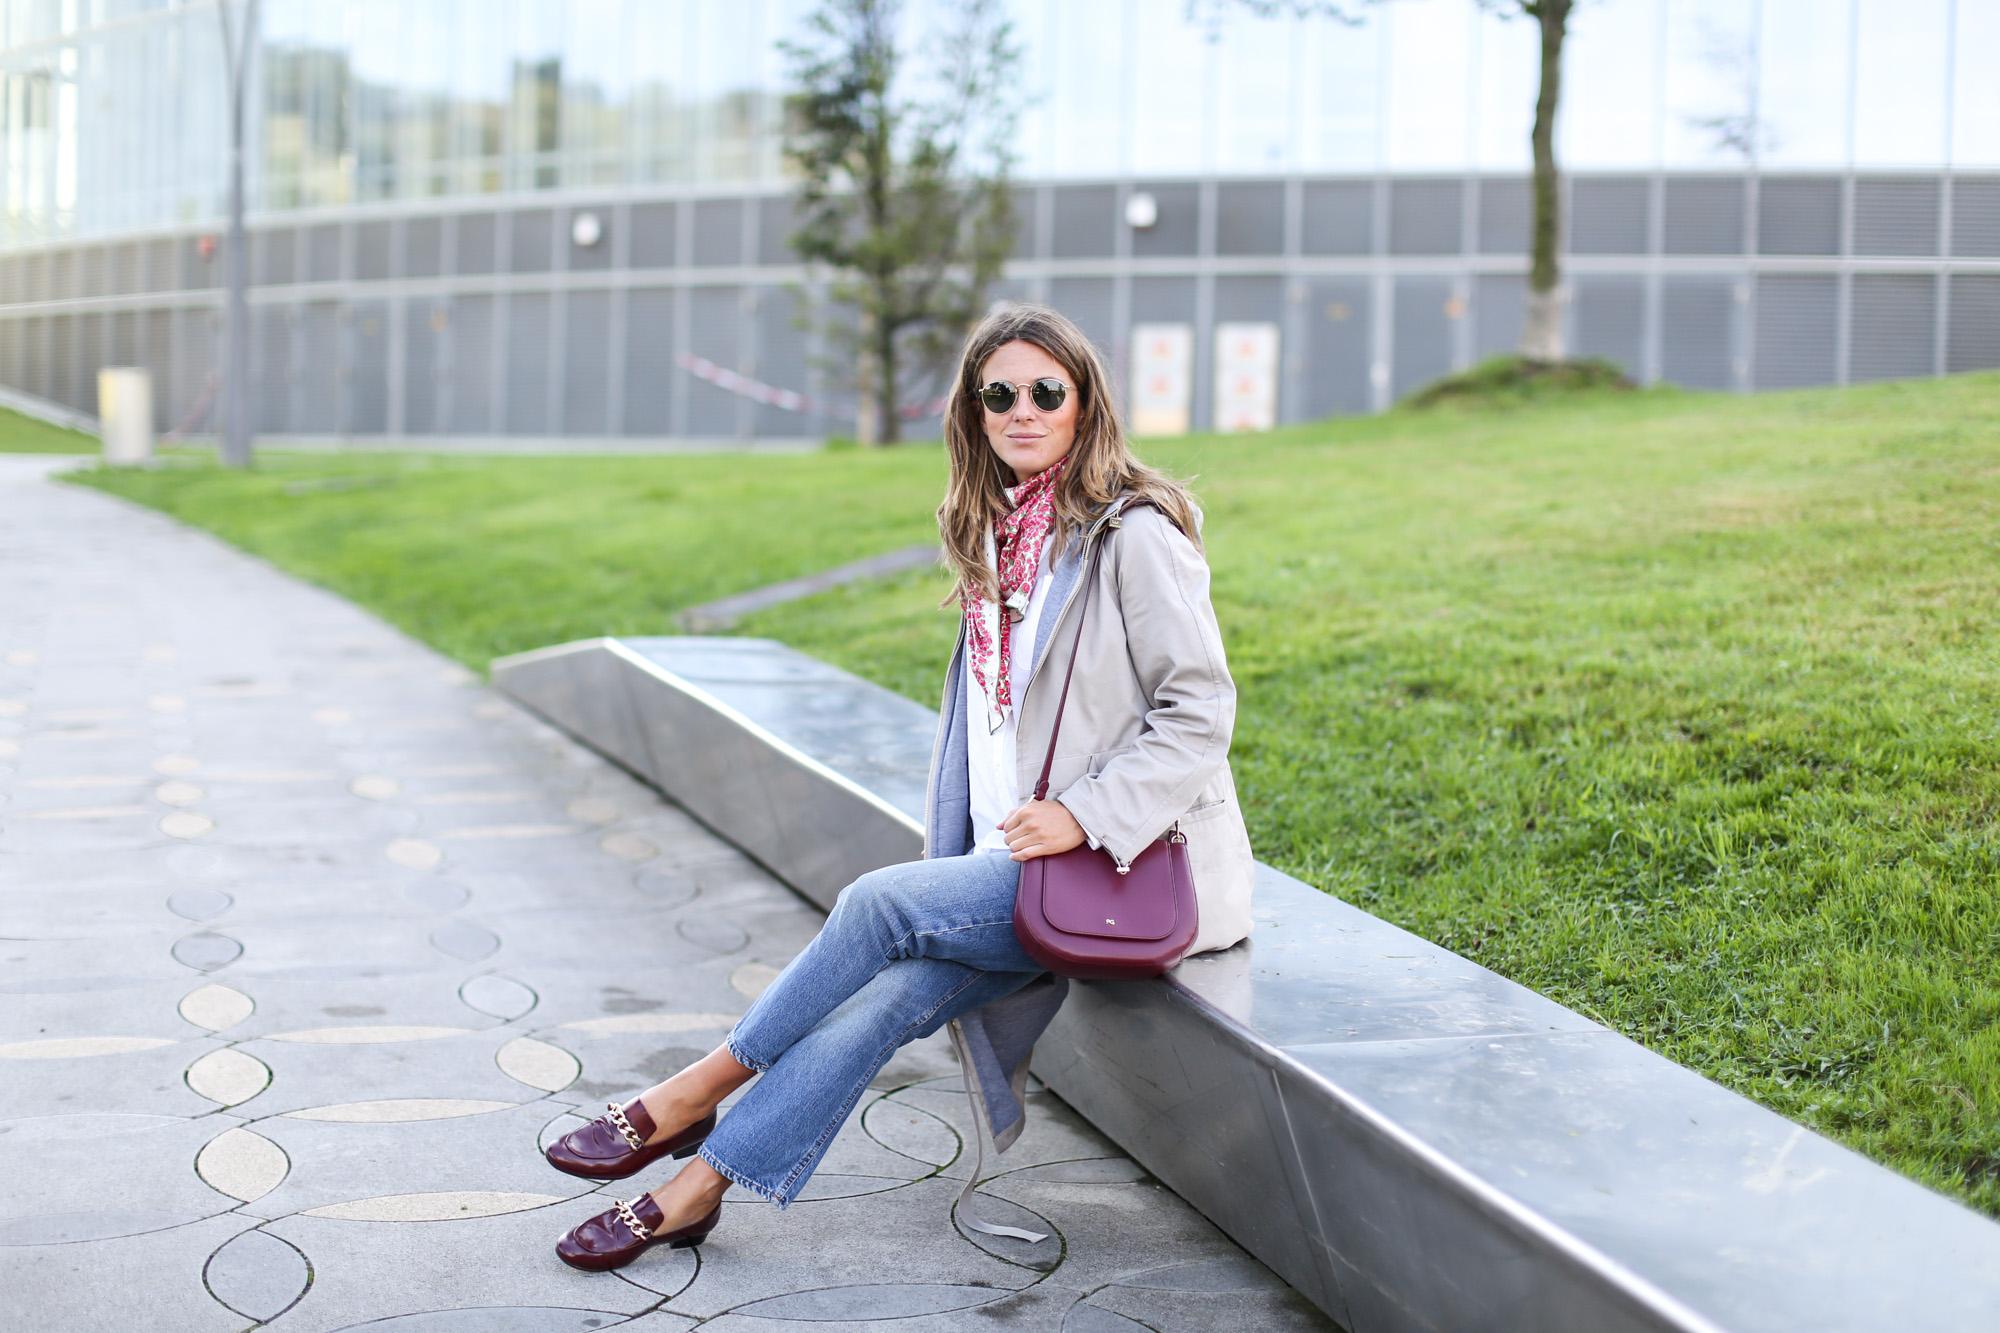 Clochet_streetstyle_fashionblogger_purificaciongarcia_pgbacktothecity_bandolerapielwestfalia_mocasinespielgranates-5